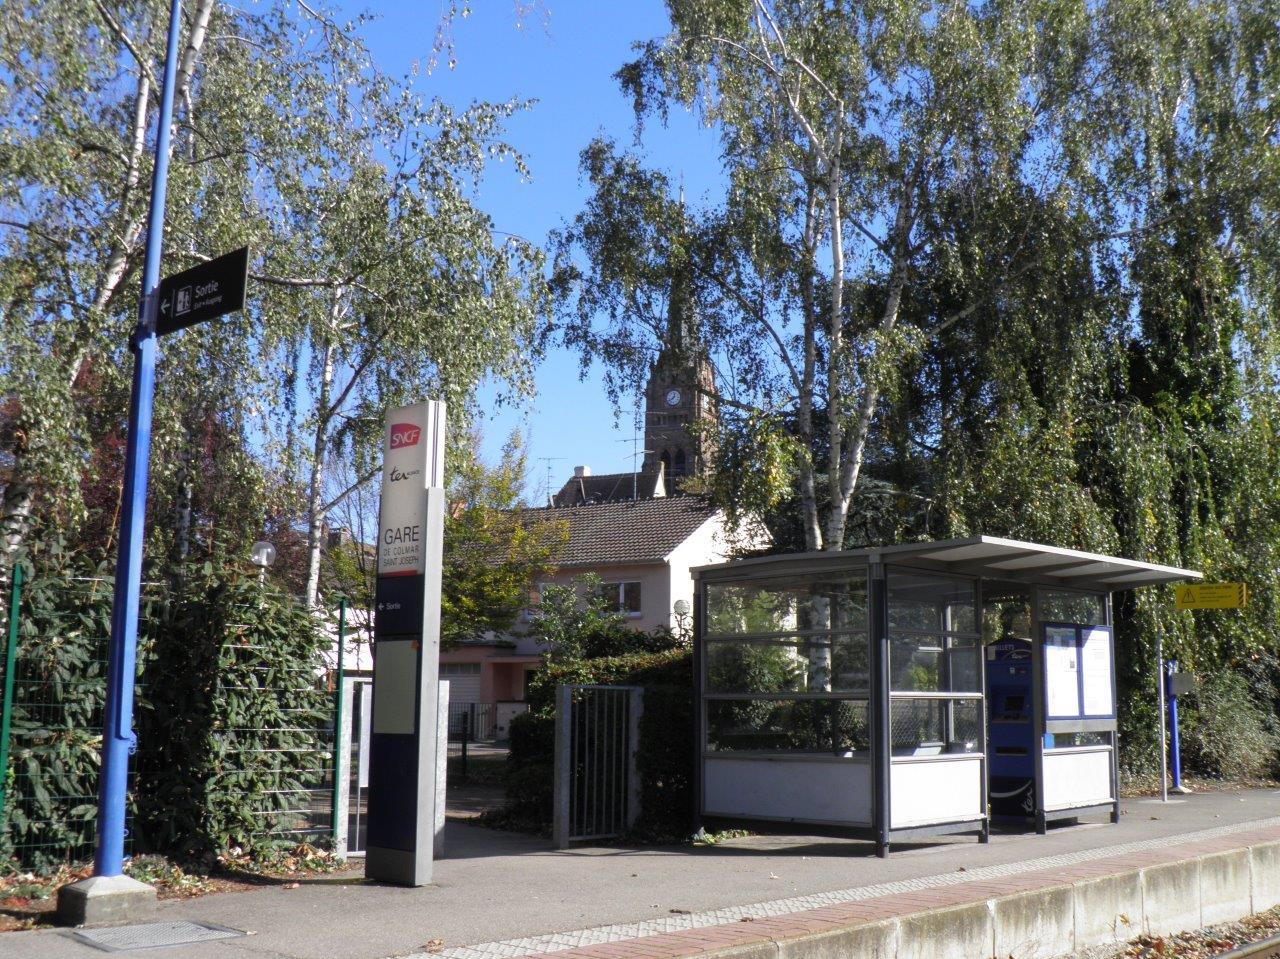 gare-de-colmar-saint-joseph-train-station